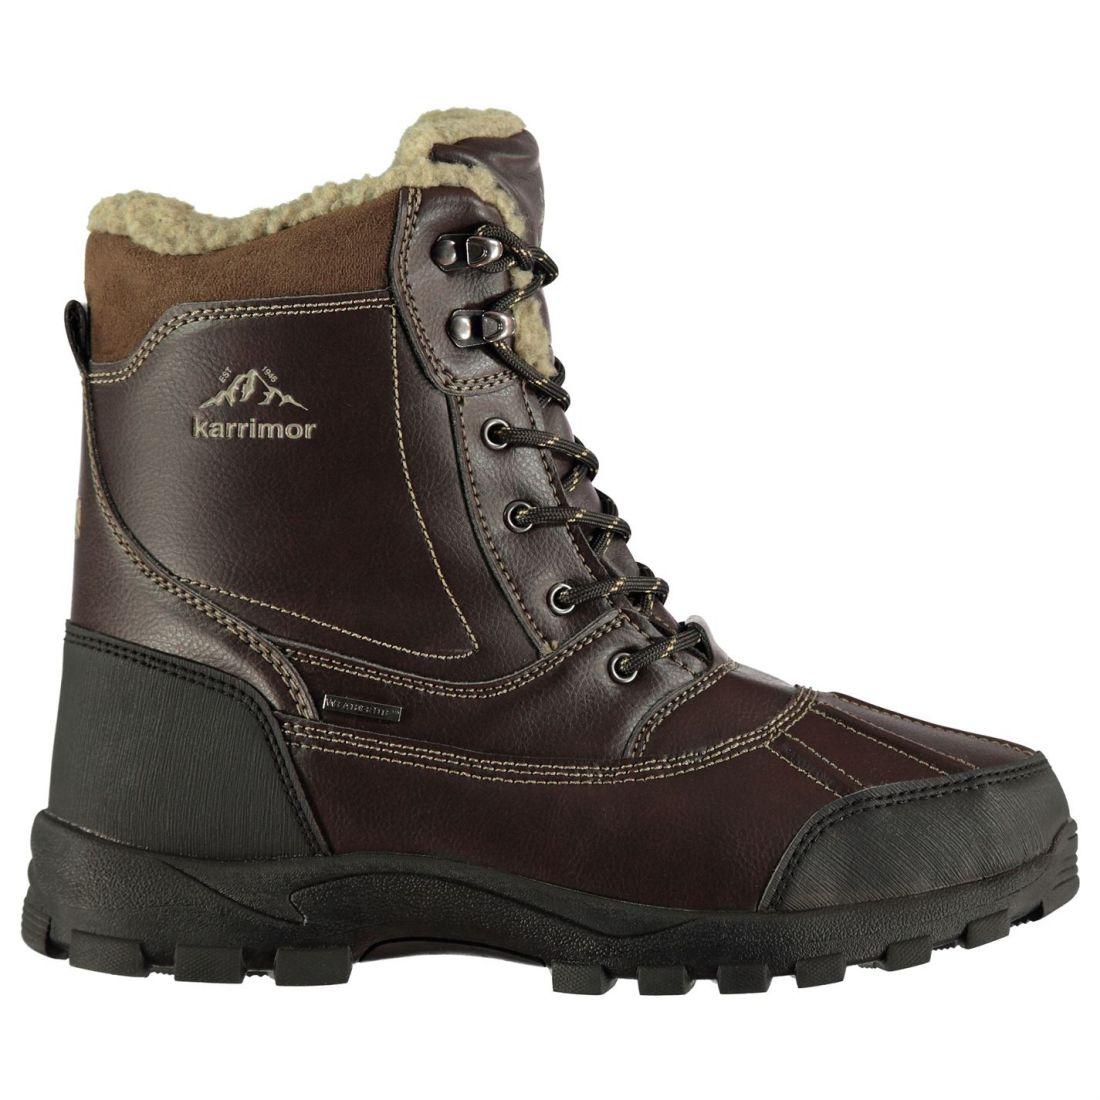 Karrimor Snow Everyday Mens Gents Boots